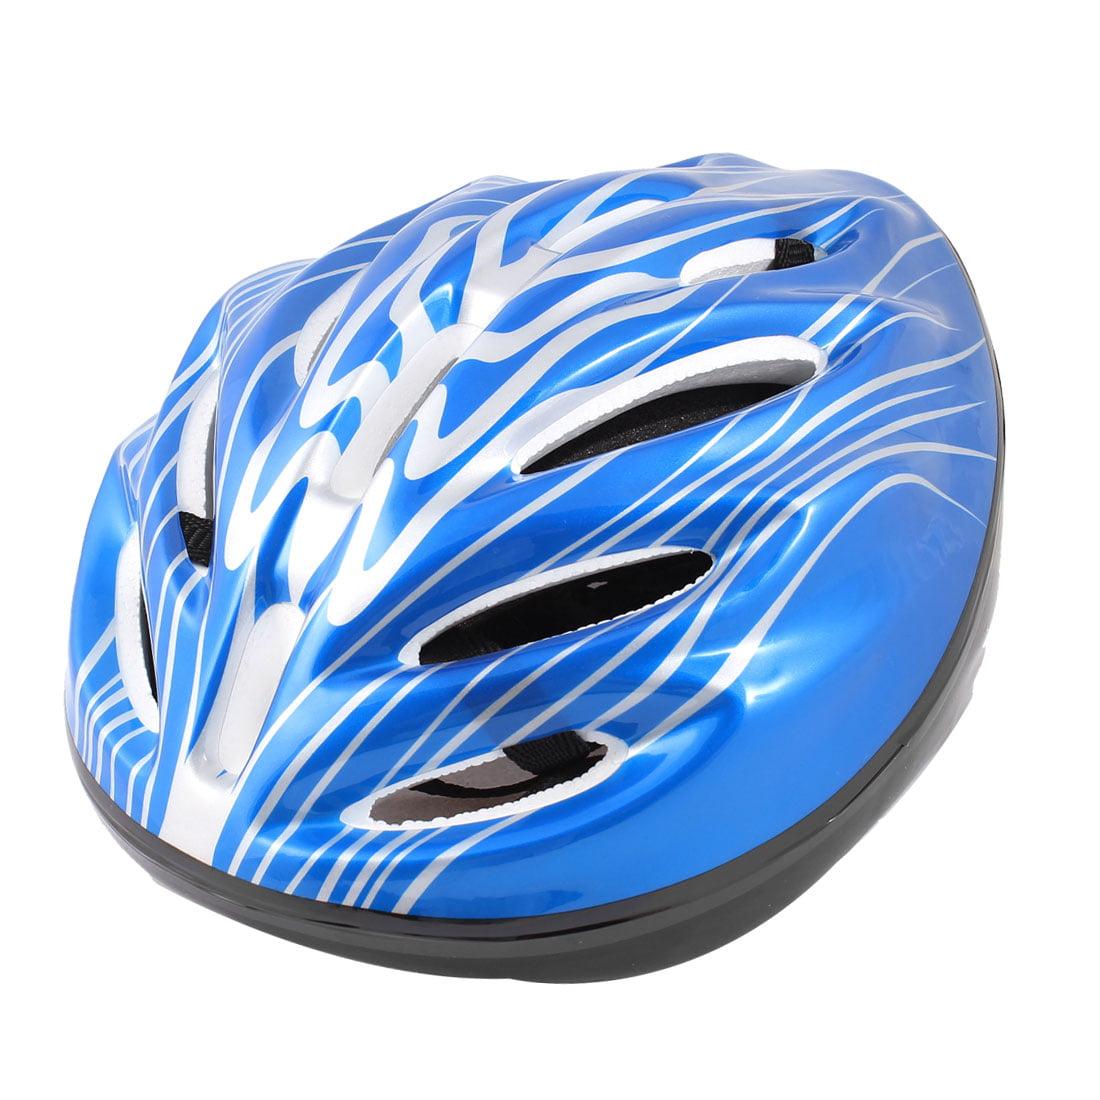 Unique Bargains Women Men Skateboard Skiing Racing Bicycle Bike Sports Helmet White Blue Black by